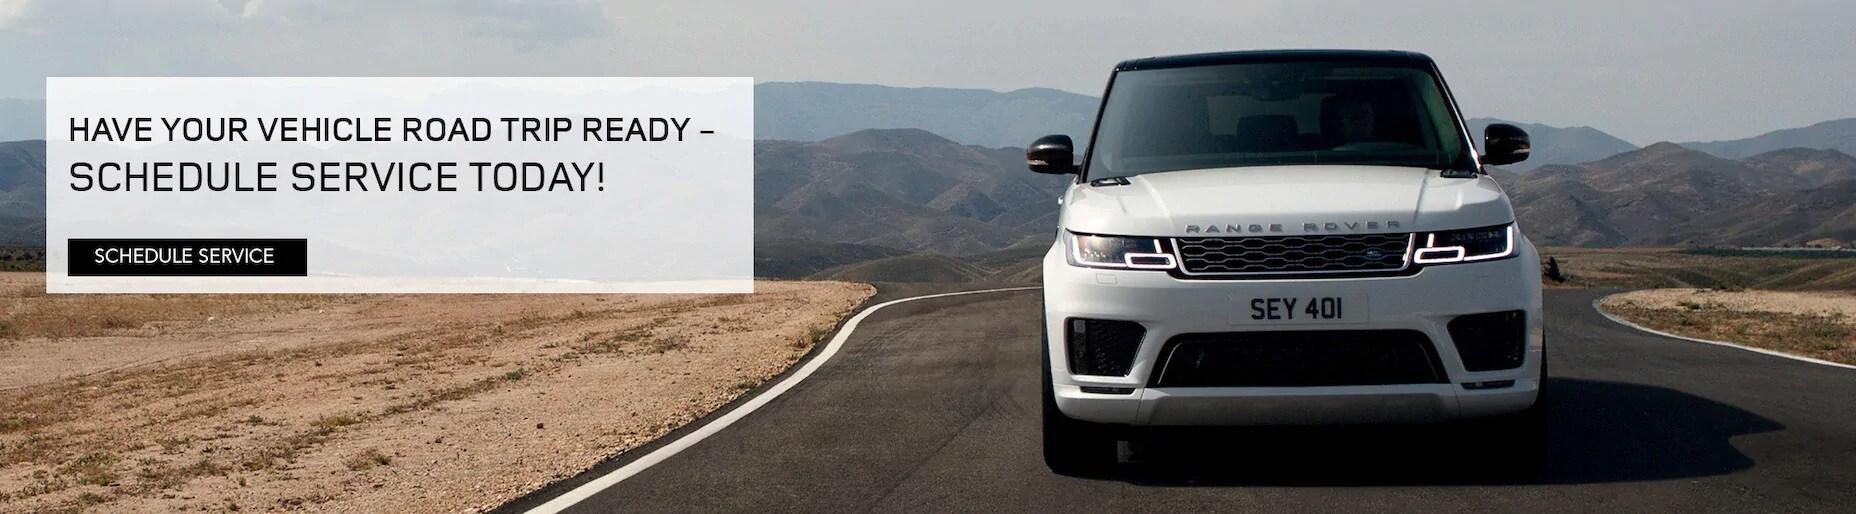 Land Rover Charlotte >> Land Rover Charlotte 2020 Upcoming Car Release